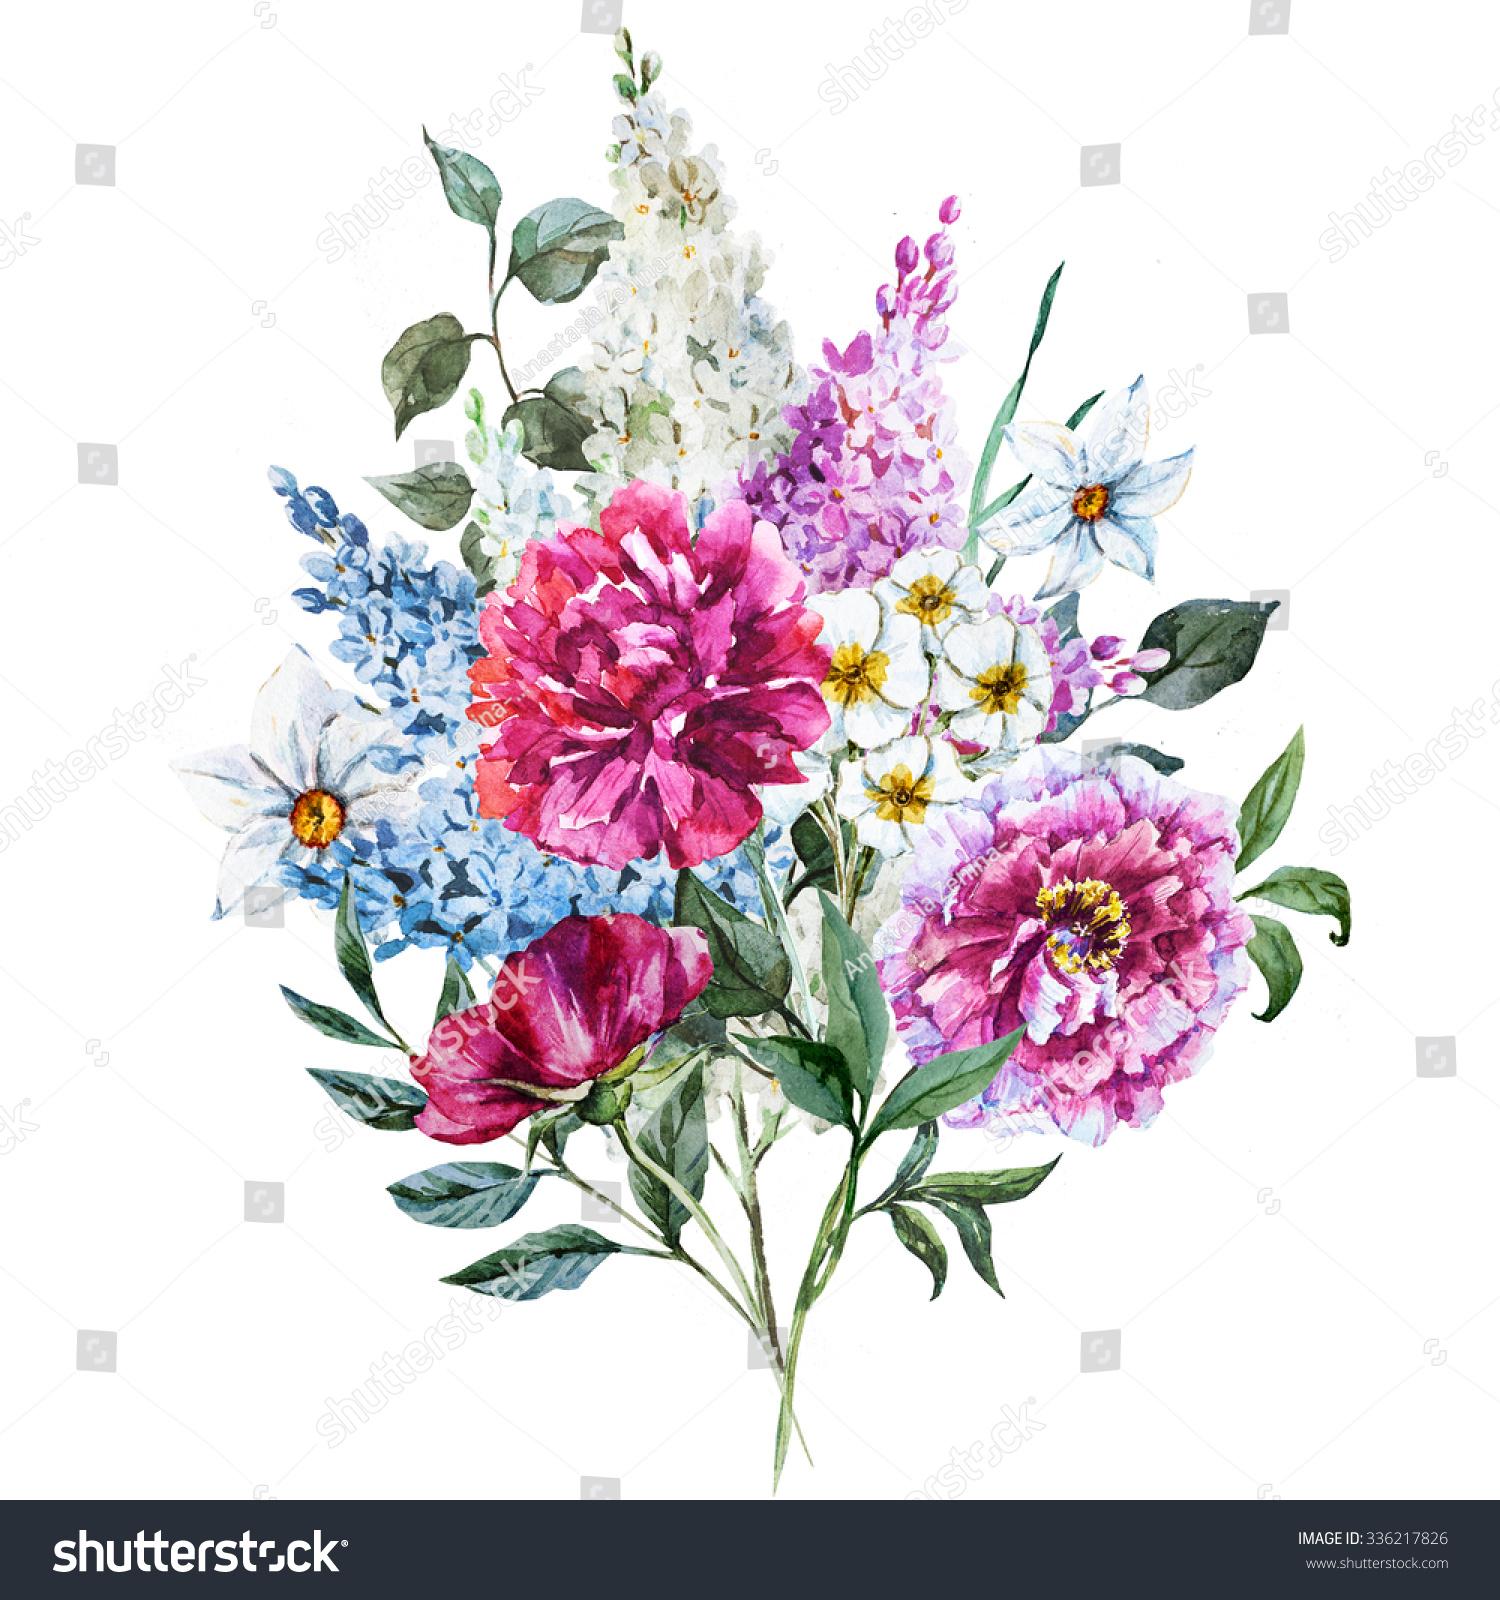 Watercolor Floral Design Vintage Greeting Floral Stock ...